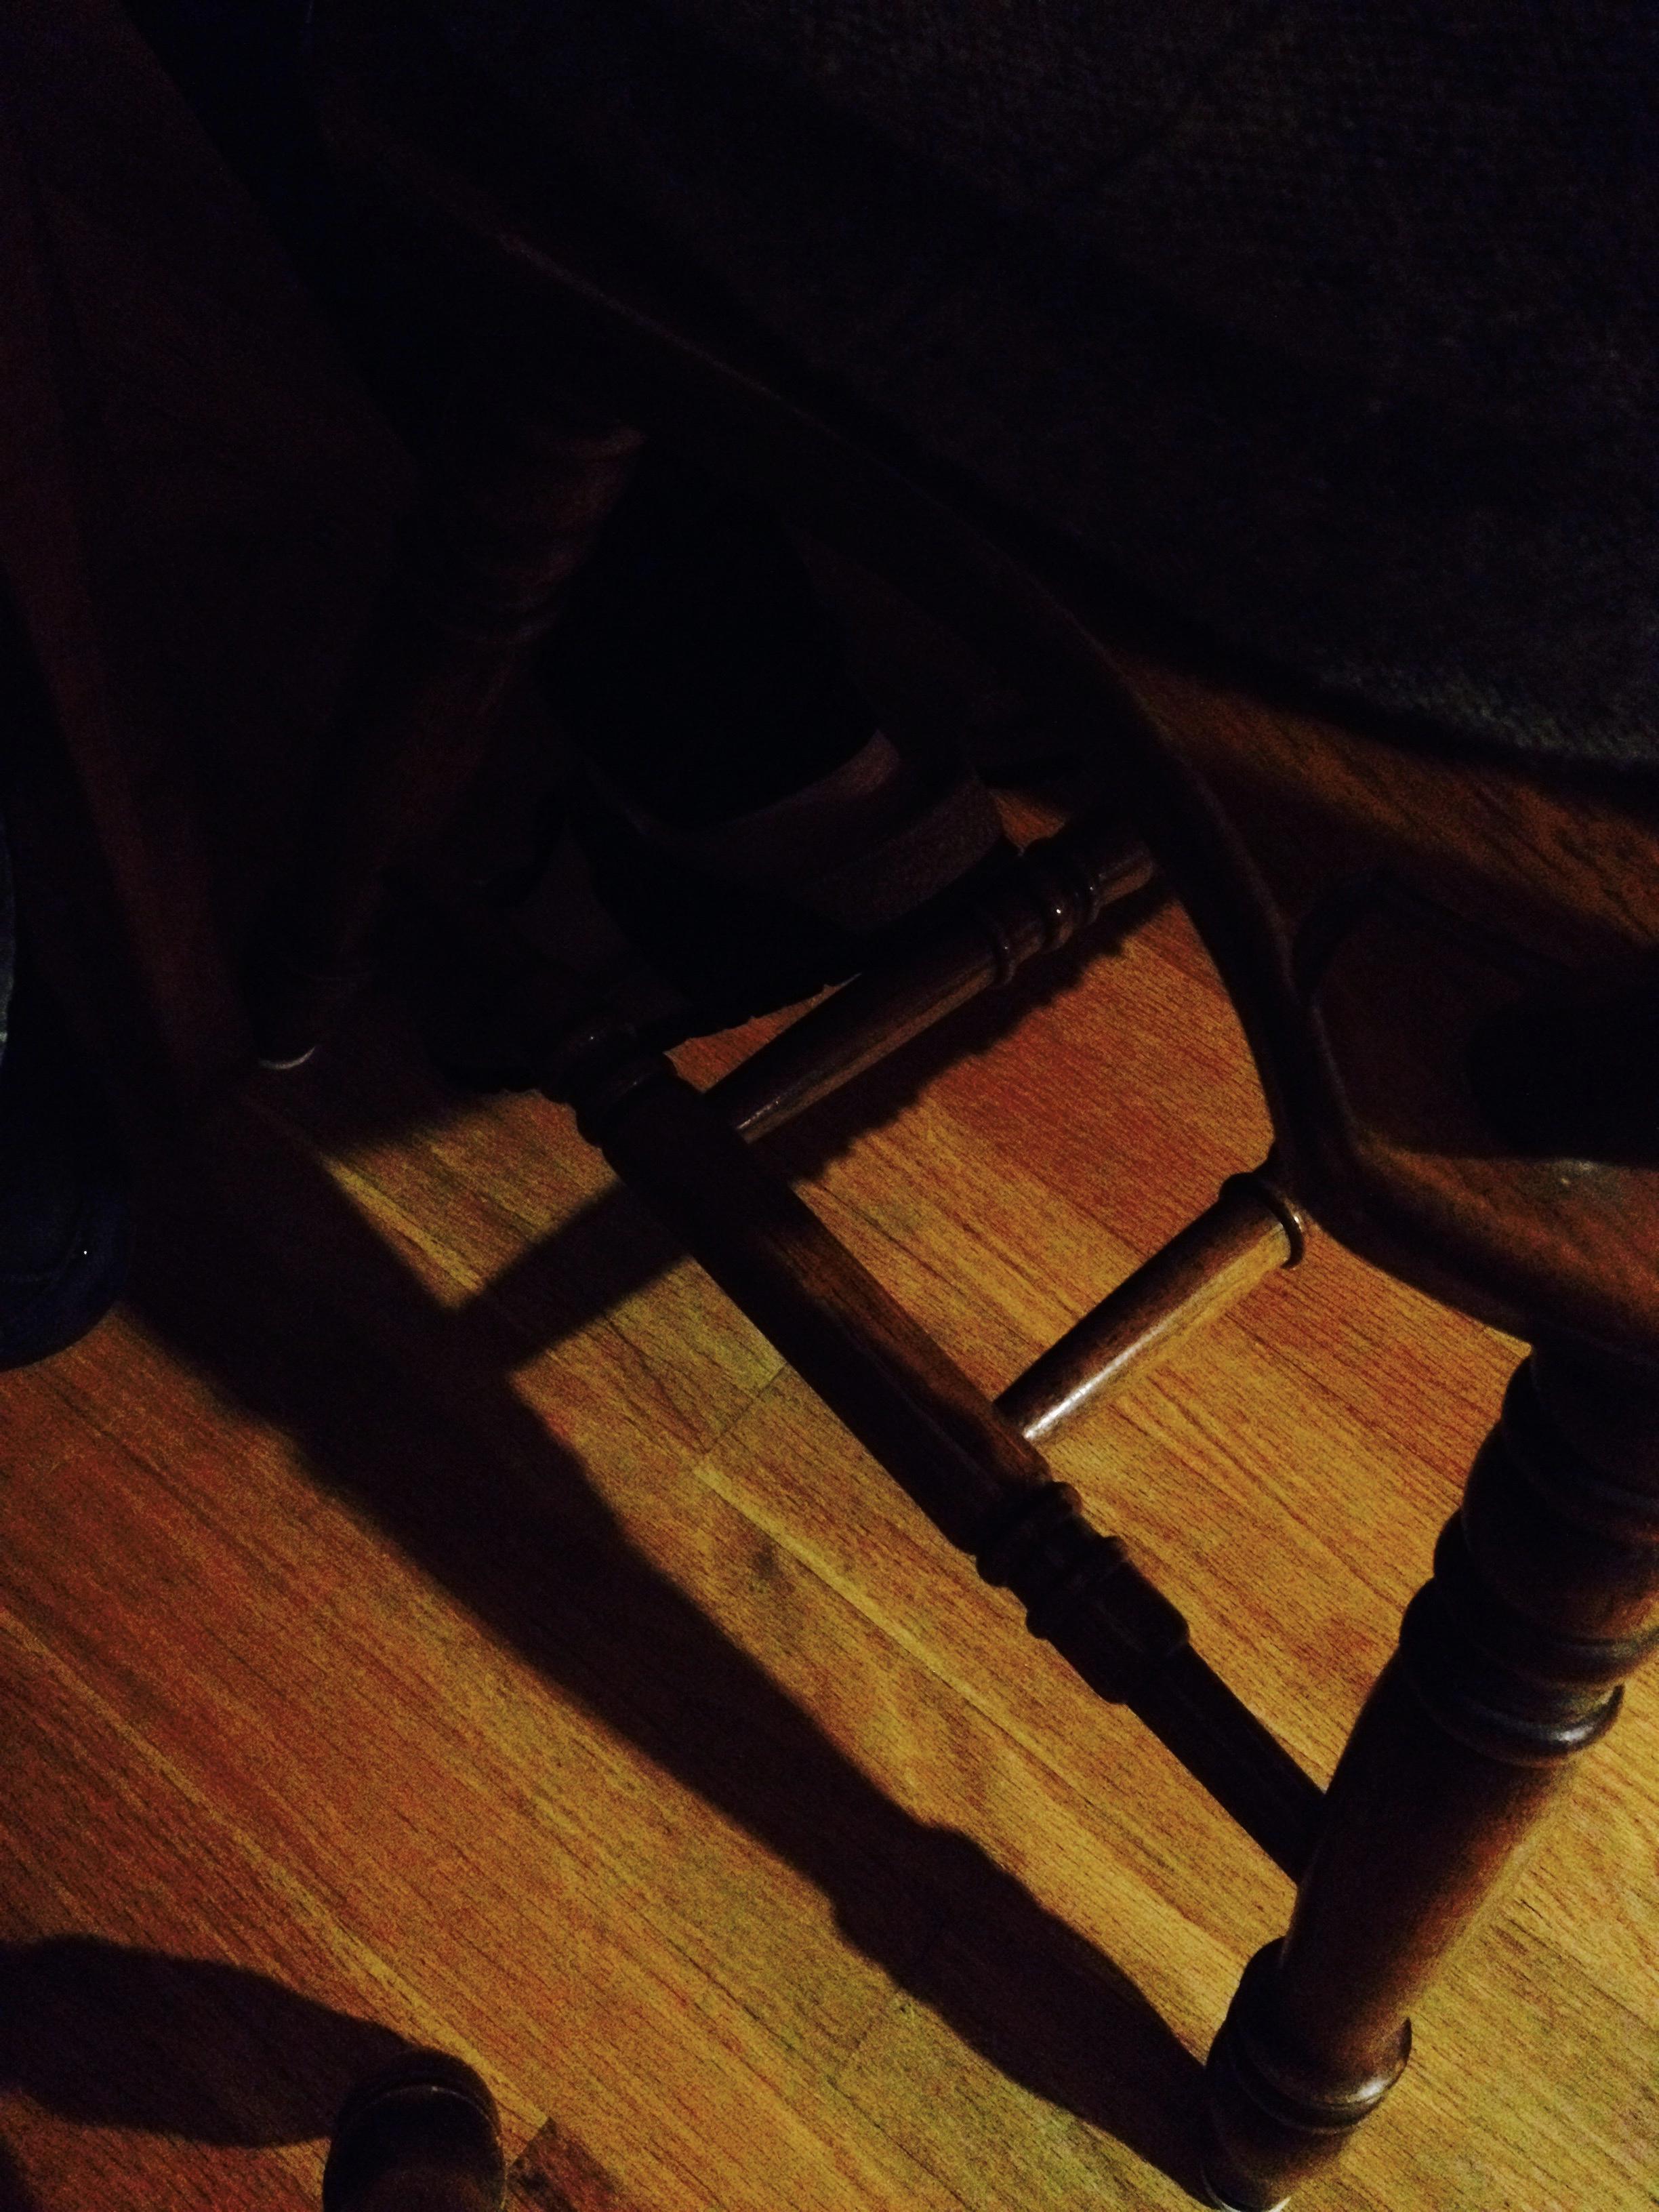 Chair leg. Madison, Wisconsin. October 2016. © William D. Walker